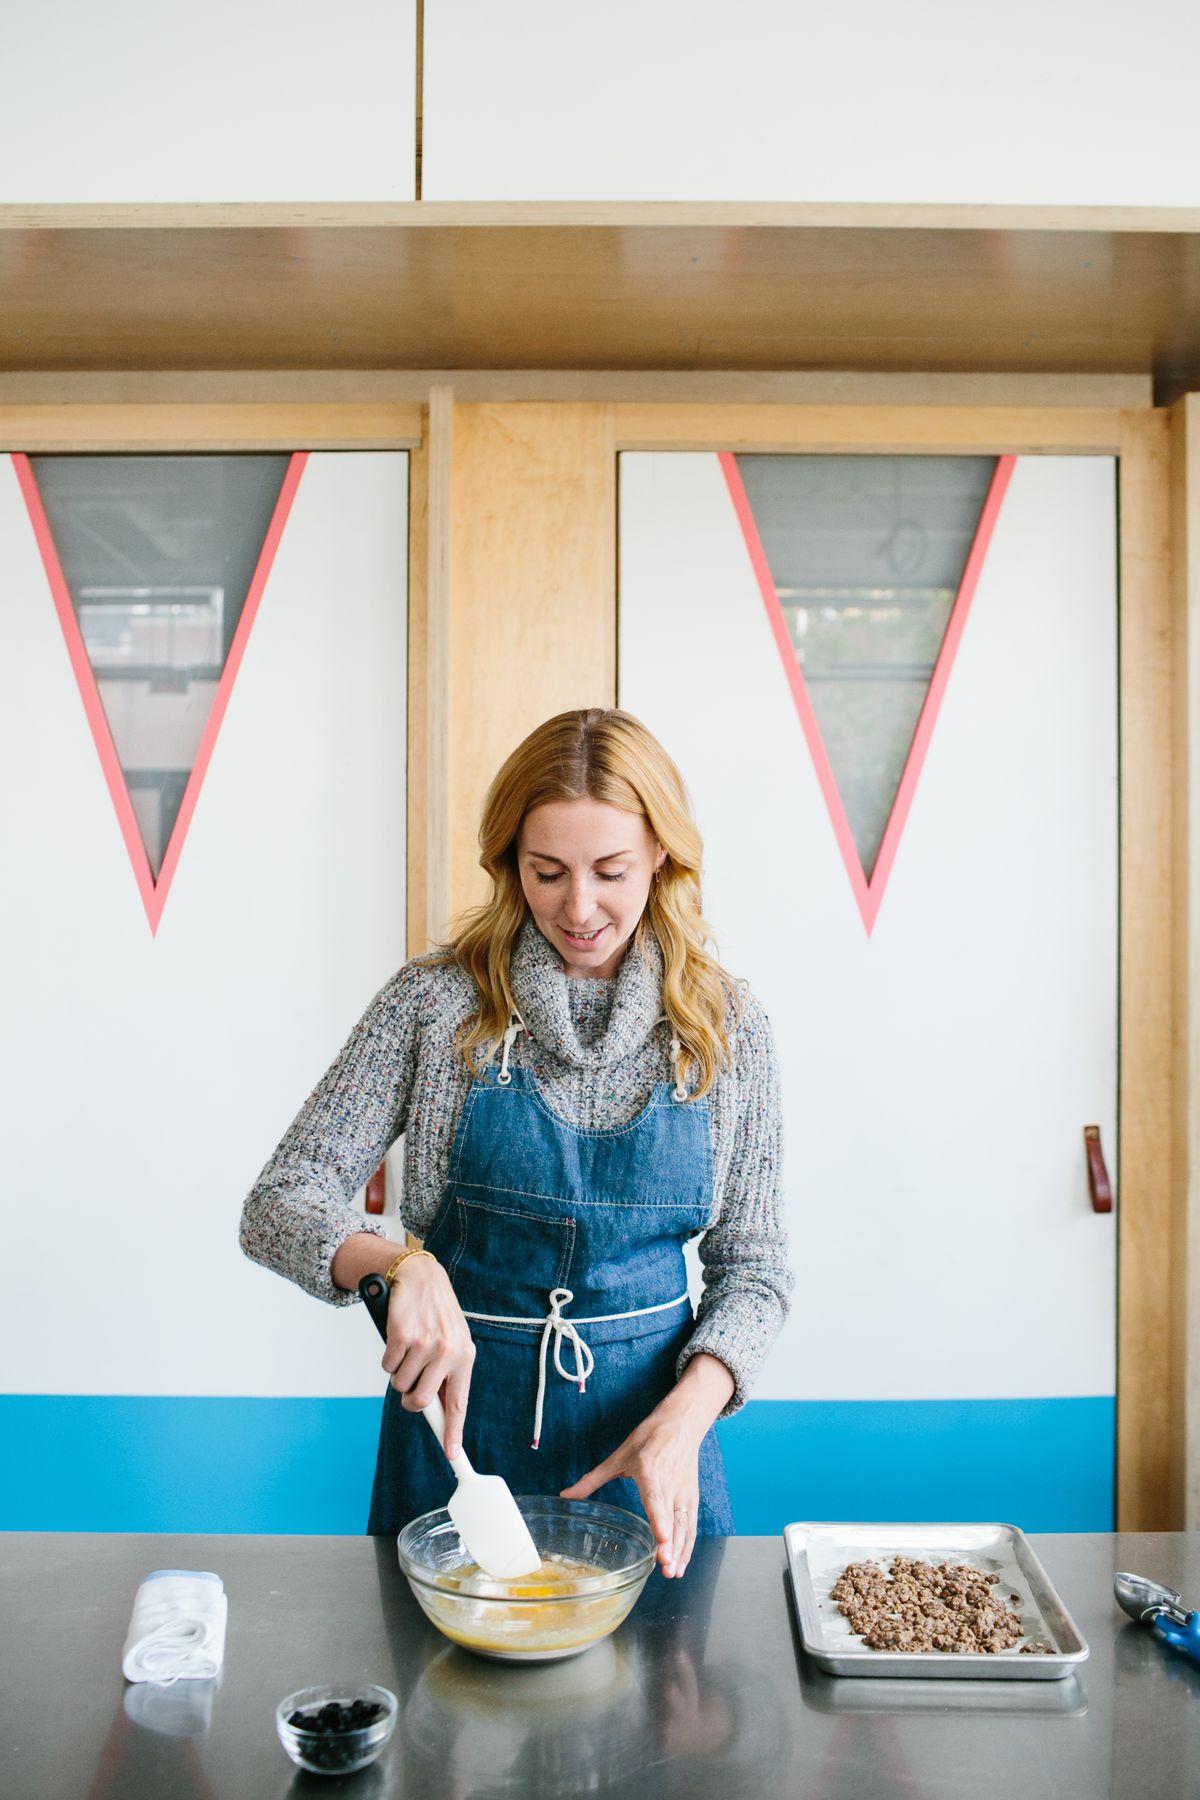 Milk Bar founder and CEO Christina Tosi